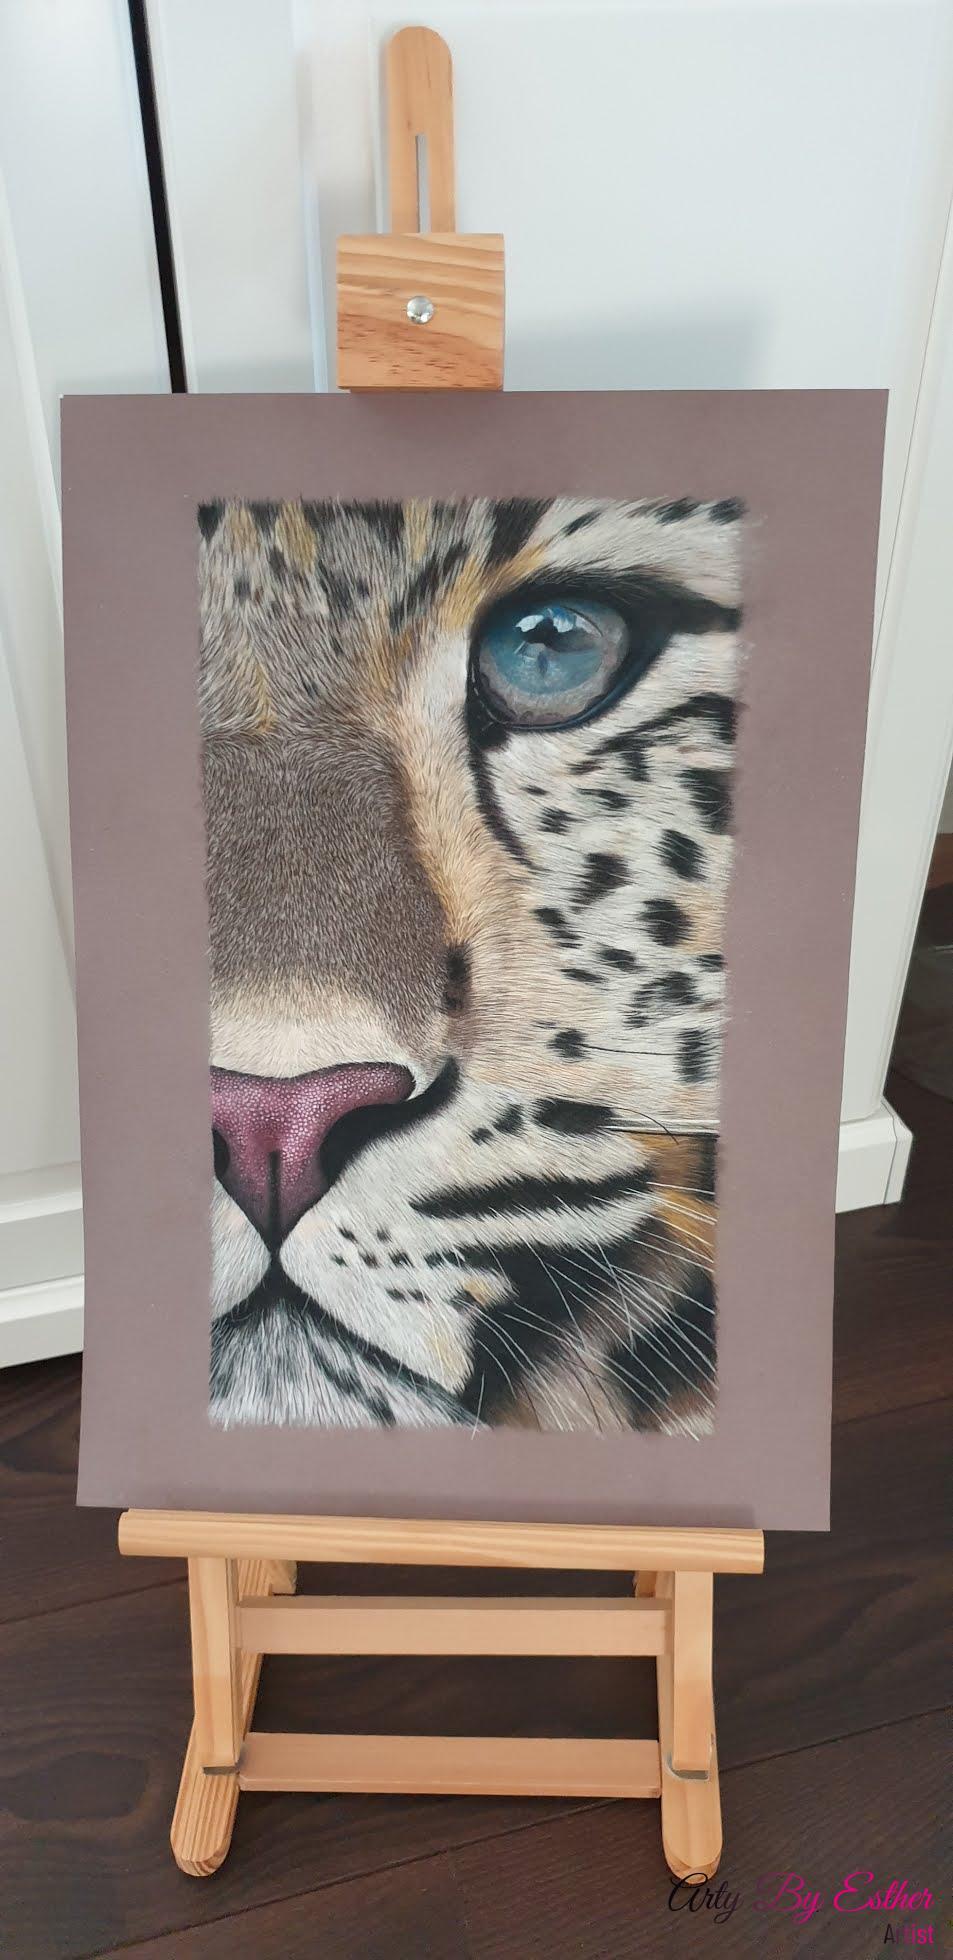 cheetah pastelpainting wildlife